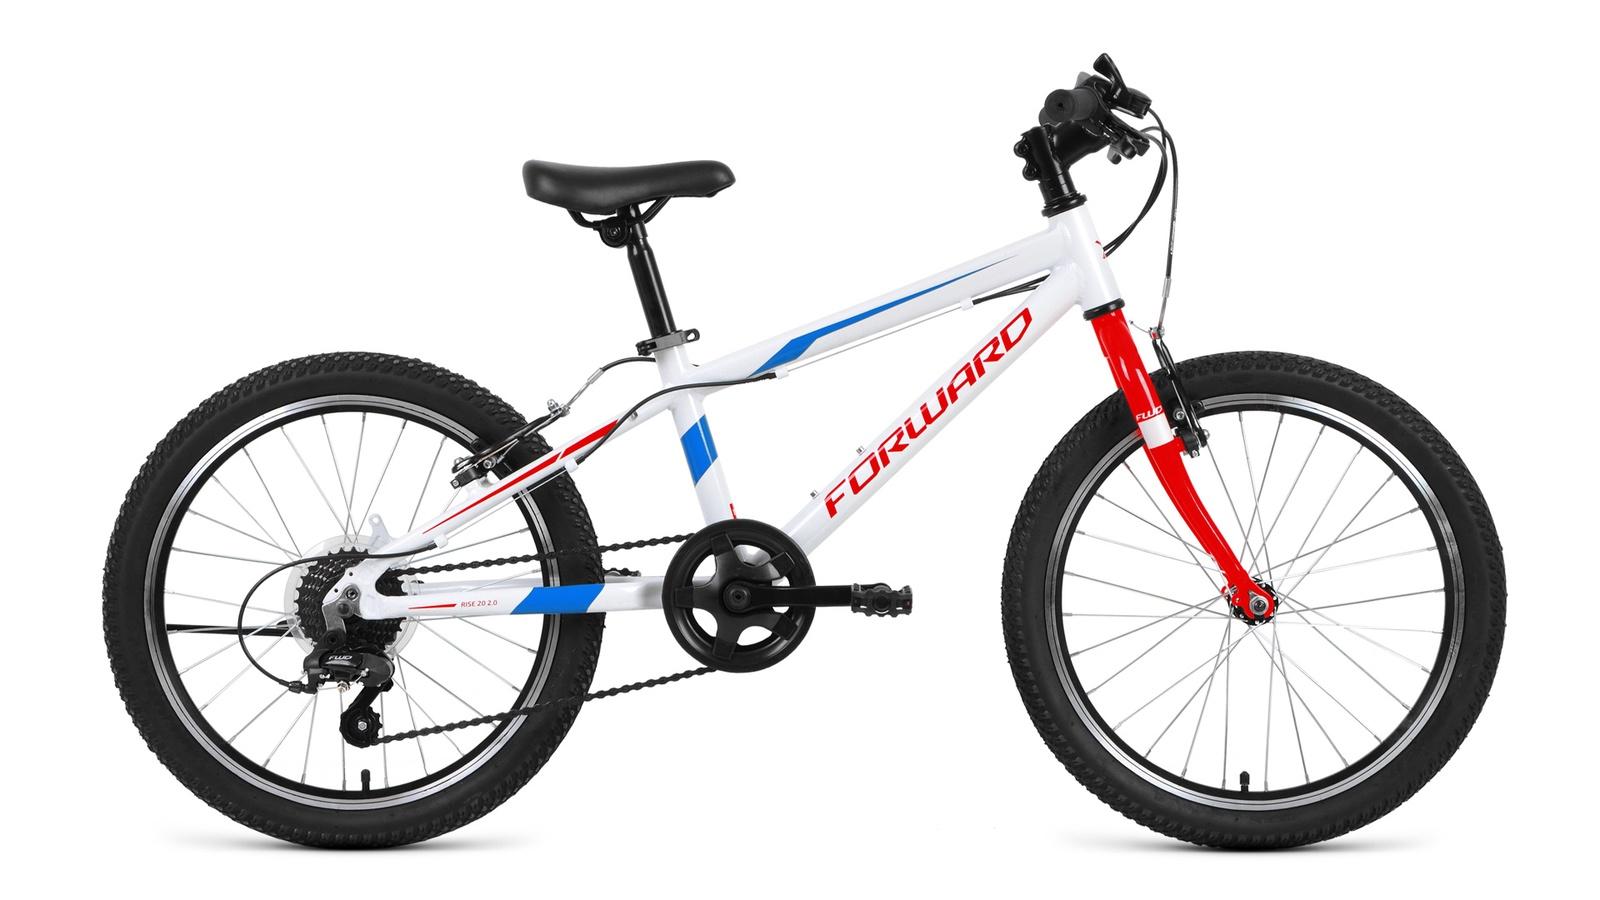 Велосипед Forward Rise 20 2.0 2019 оранжевый/белый велосипед forward zigzag 2019